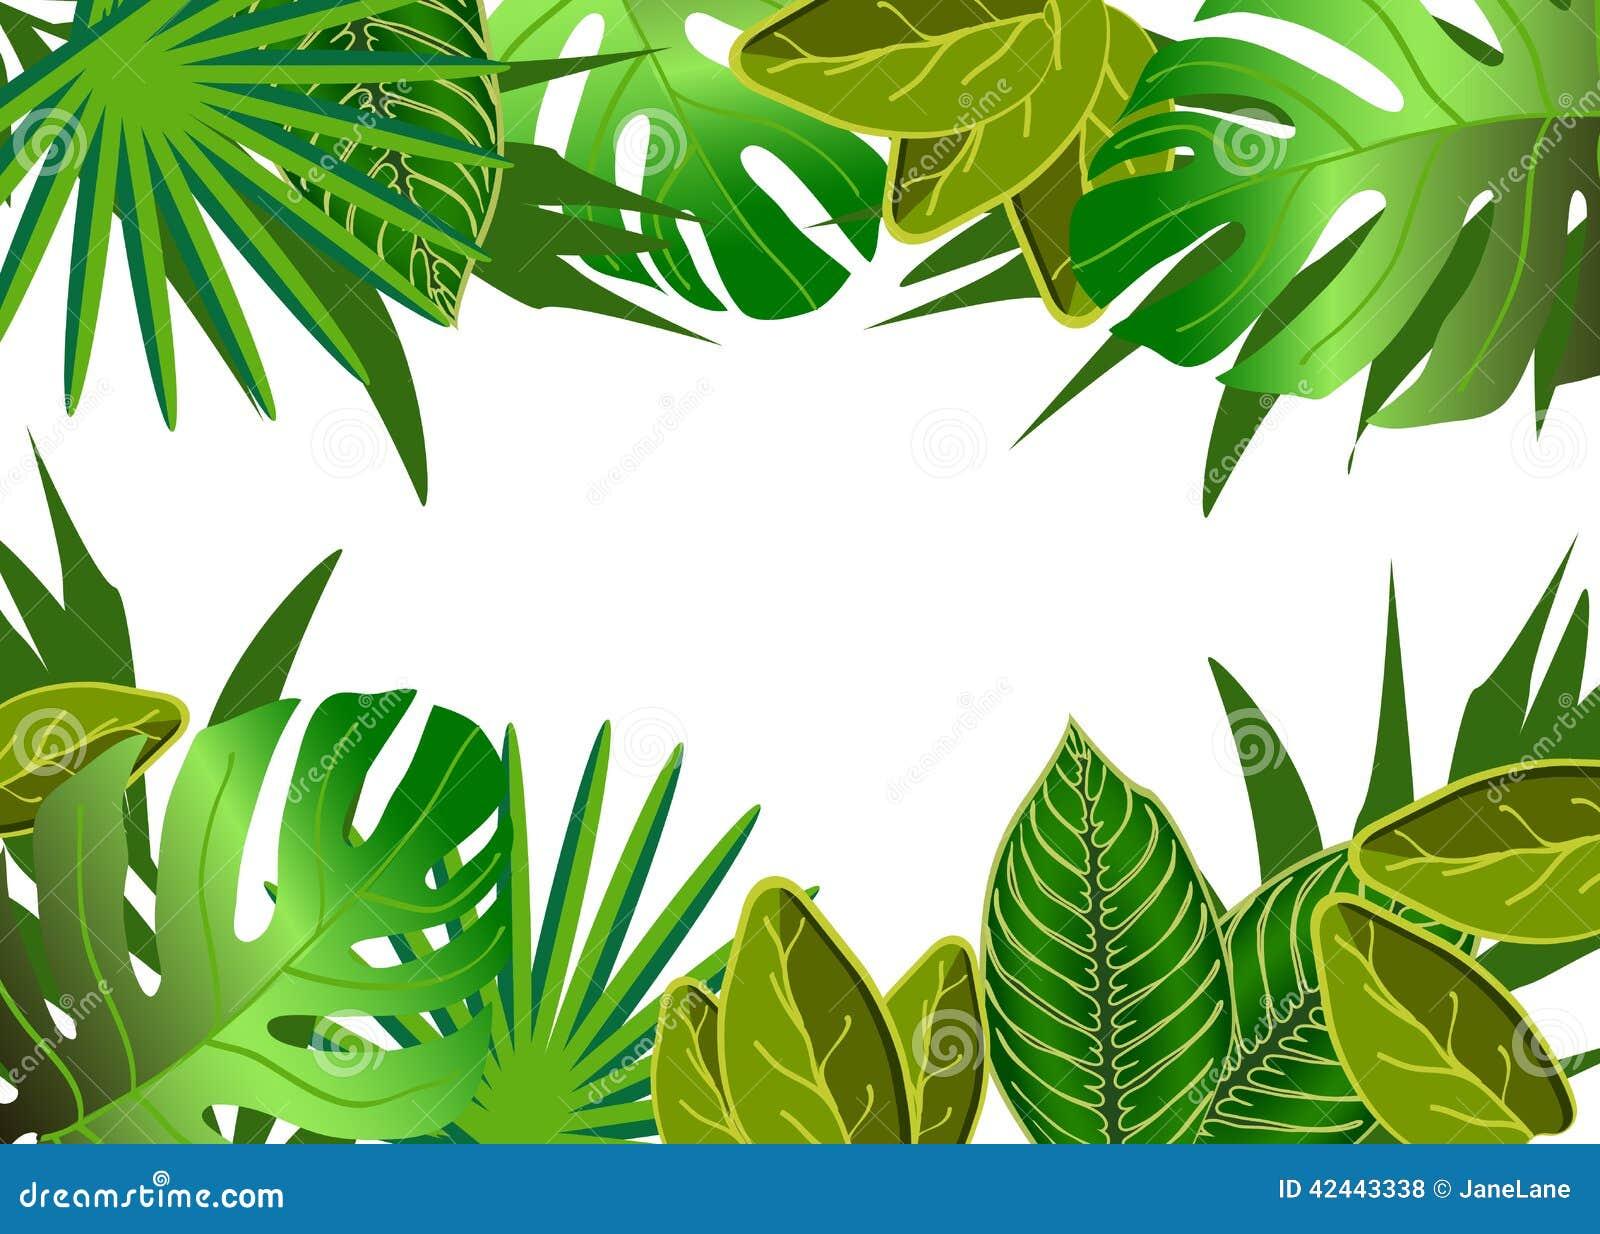 El verde tropical deja el ejemplo